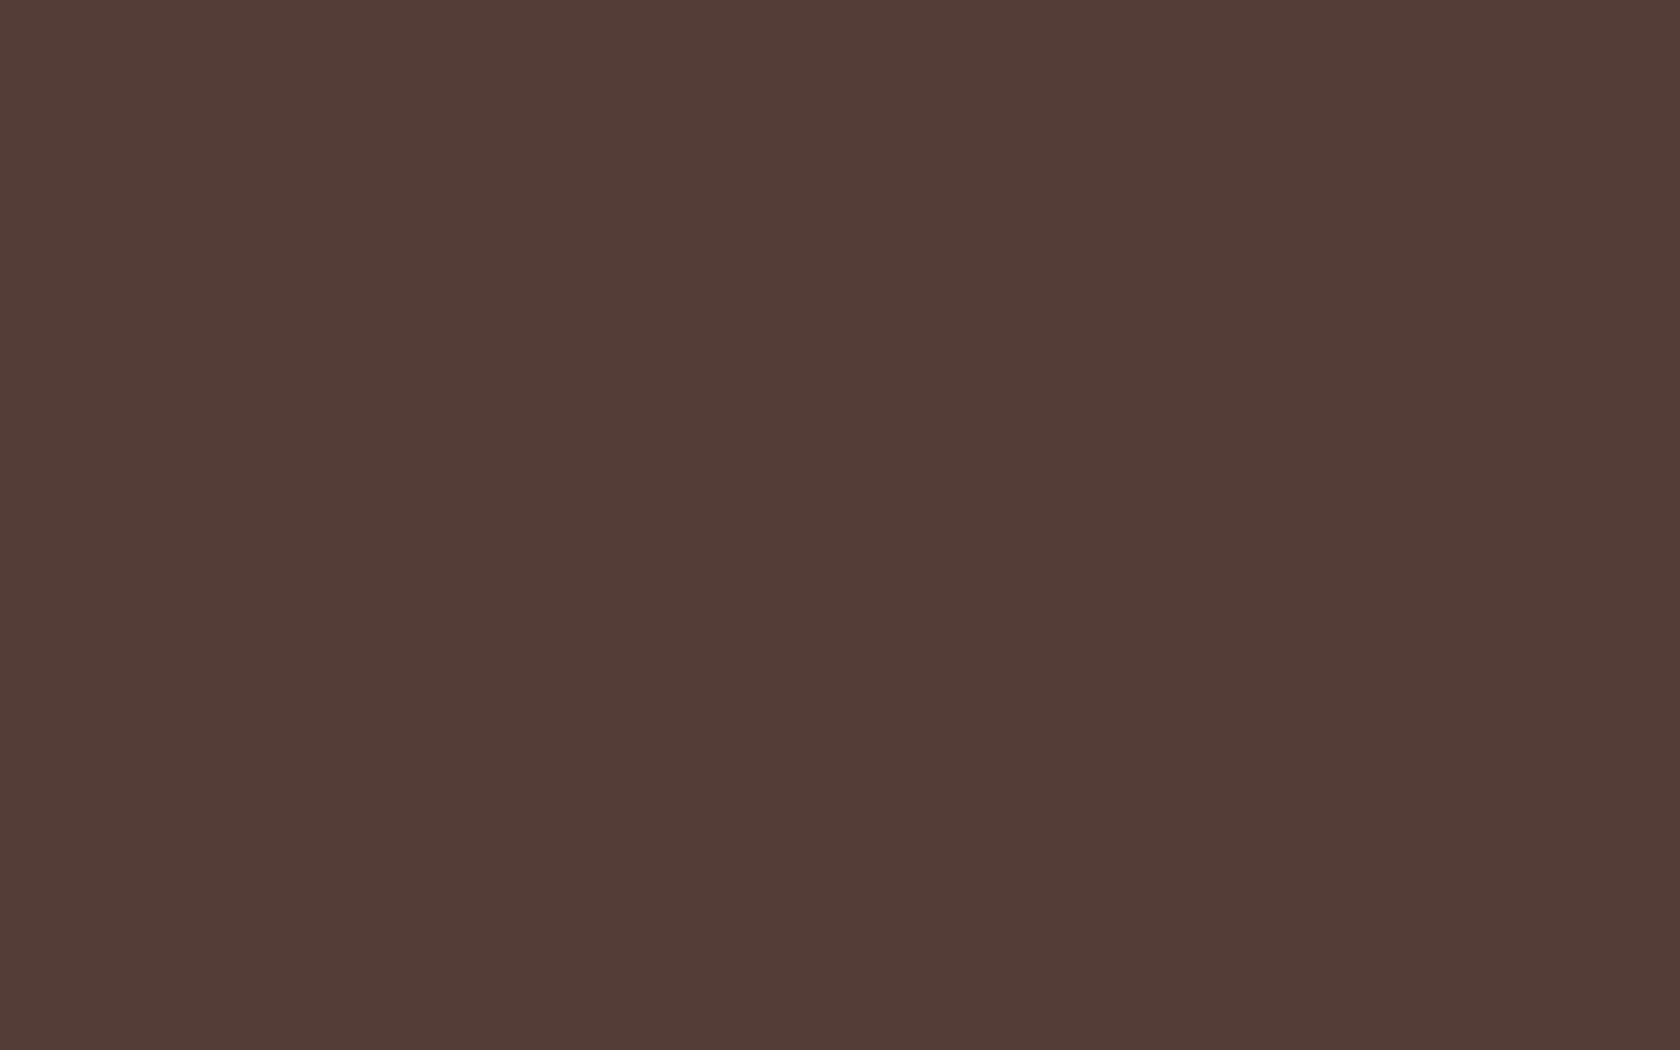 1680x1050 Dark Liver Horses Solid Color Background